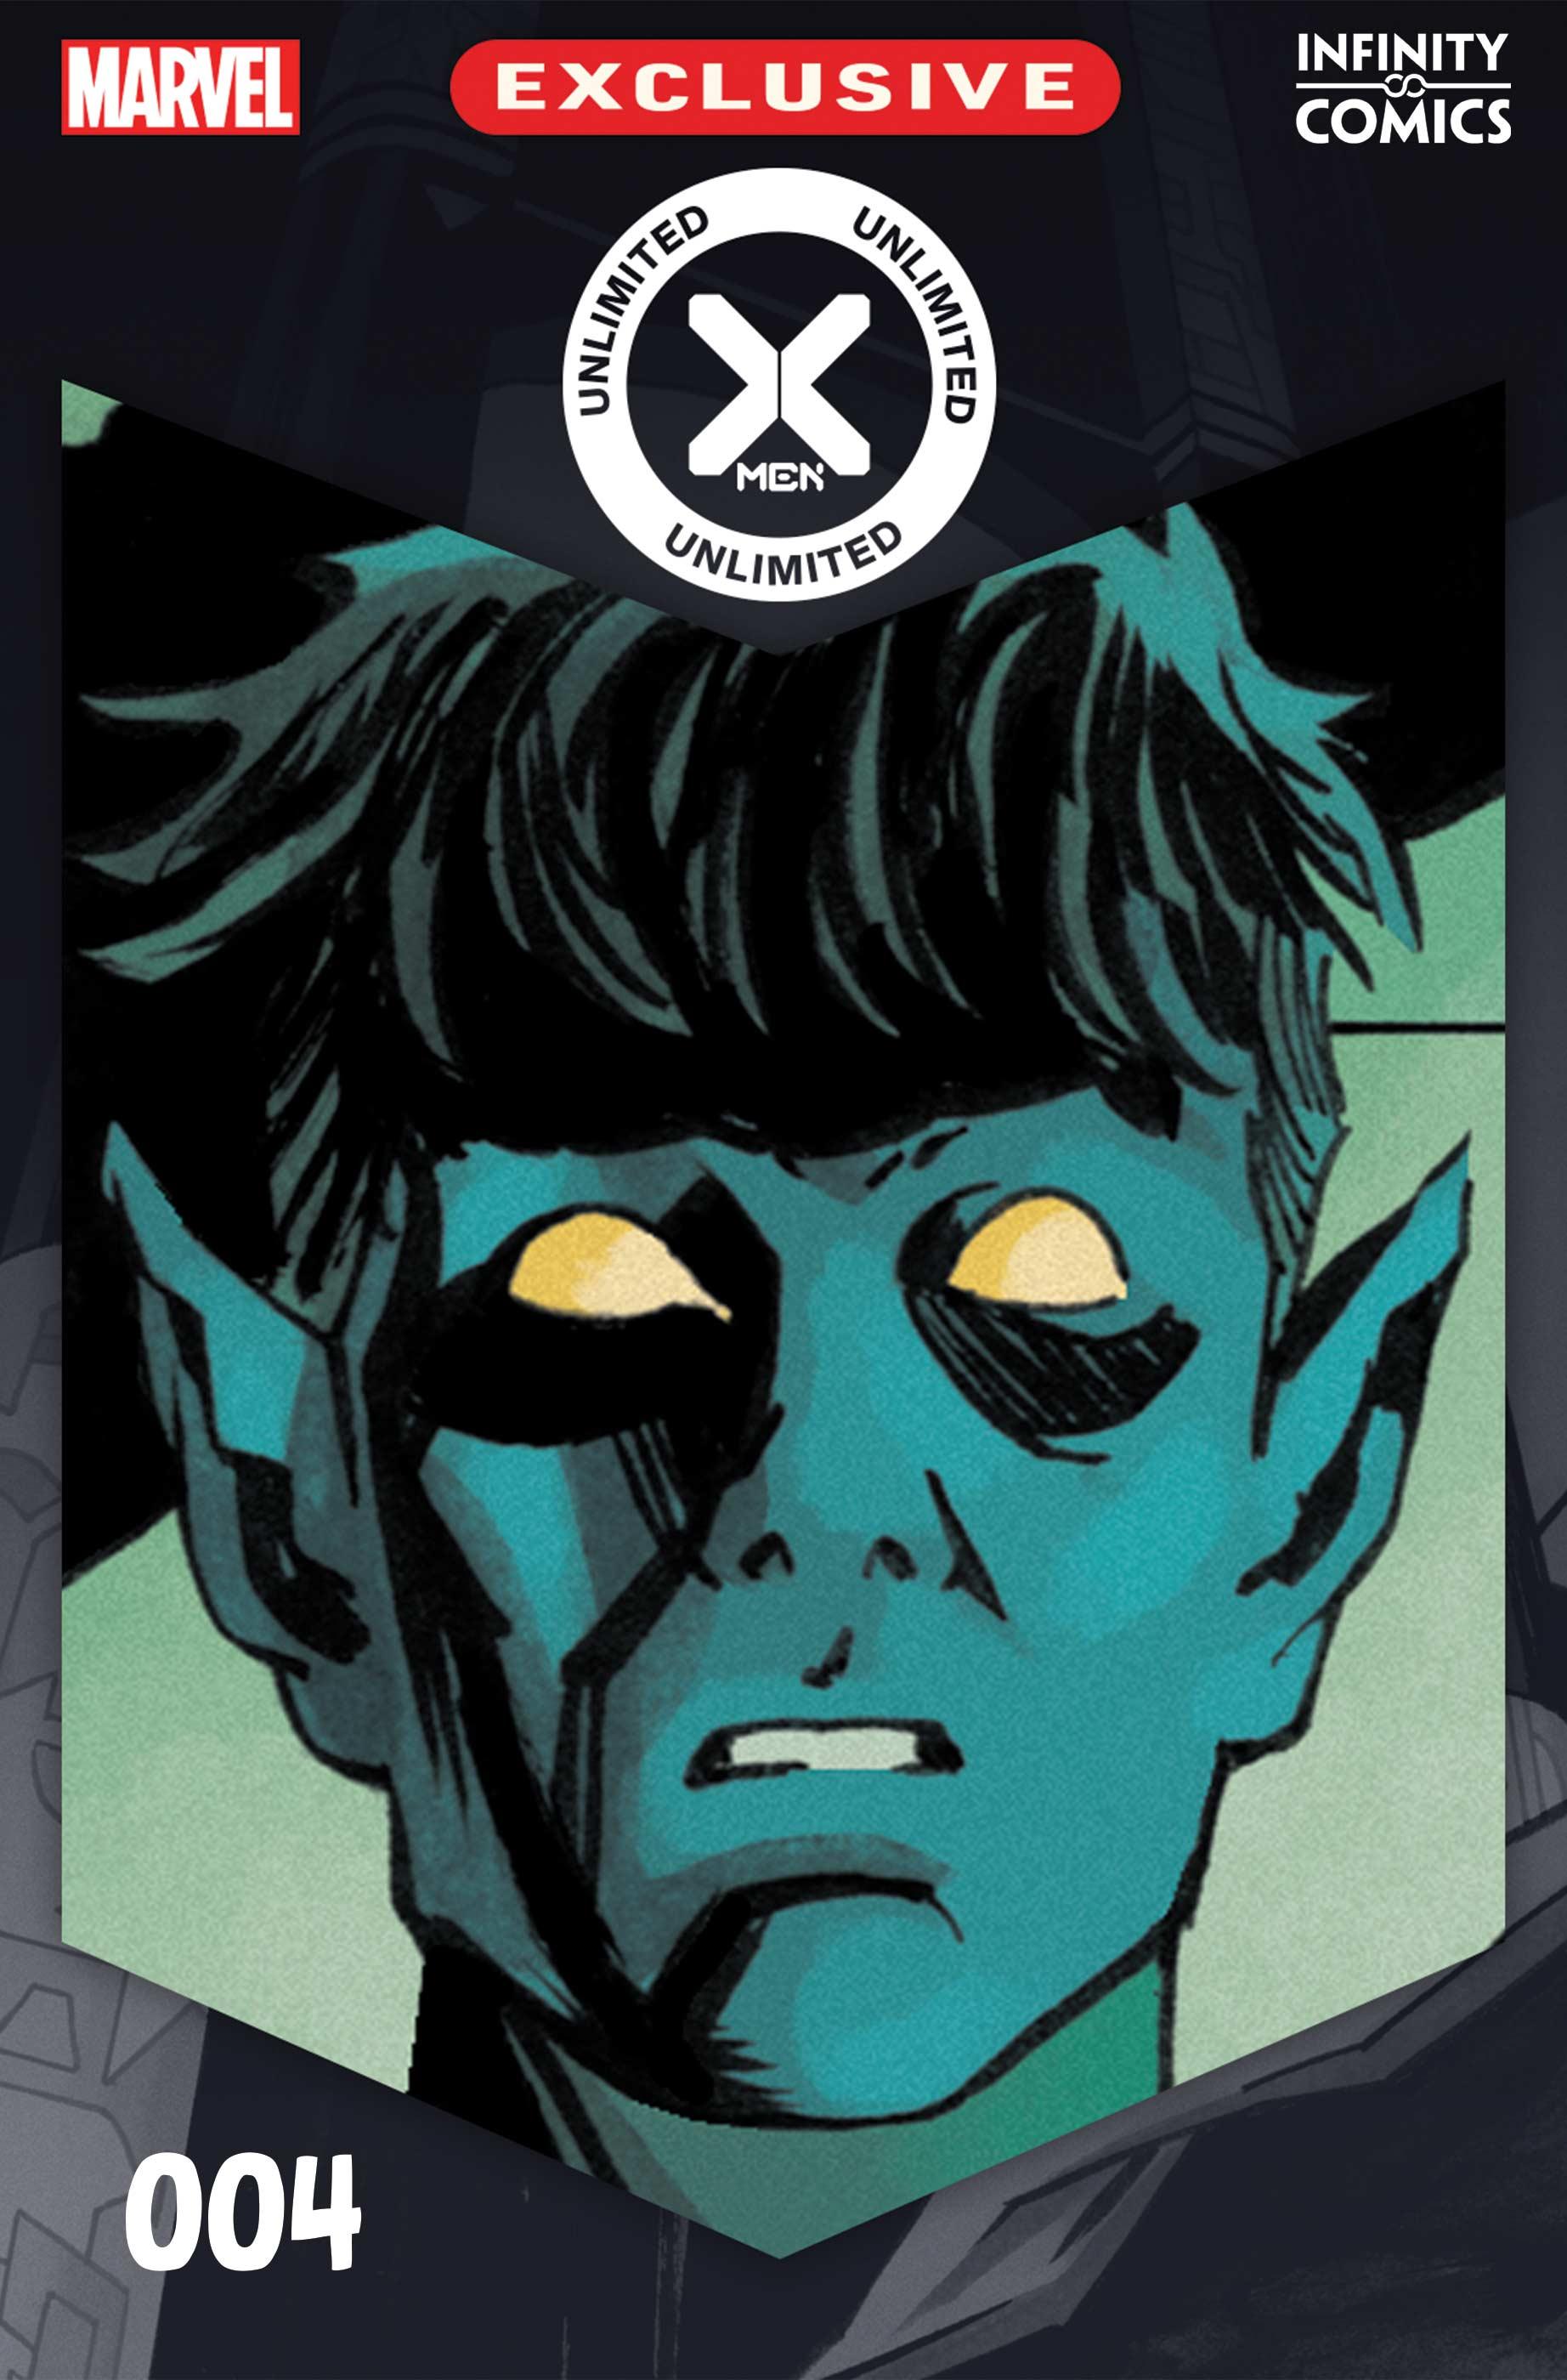 X-Men Unlimited Infinity Comic (2021) #4